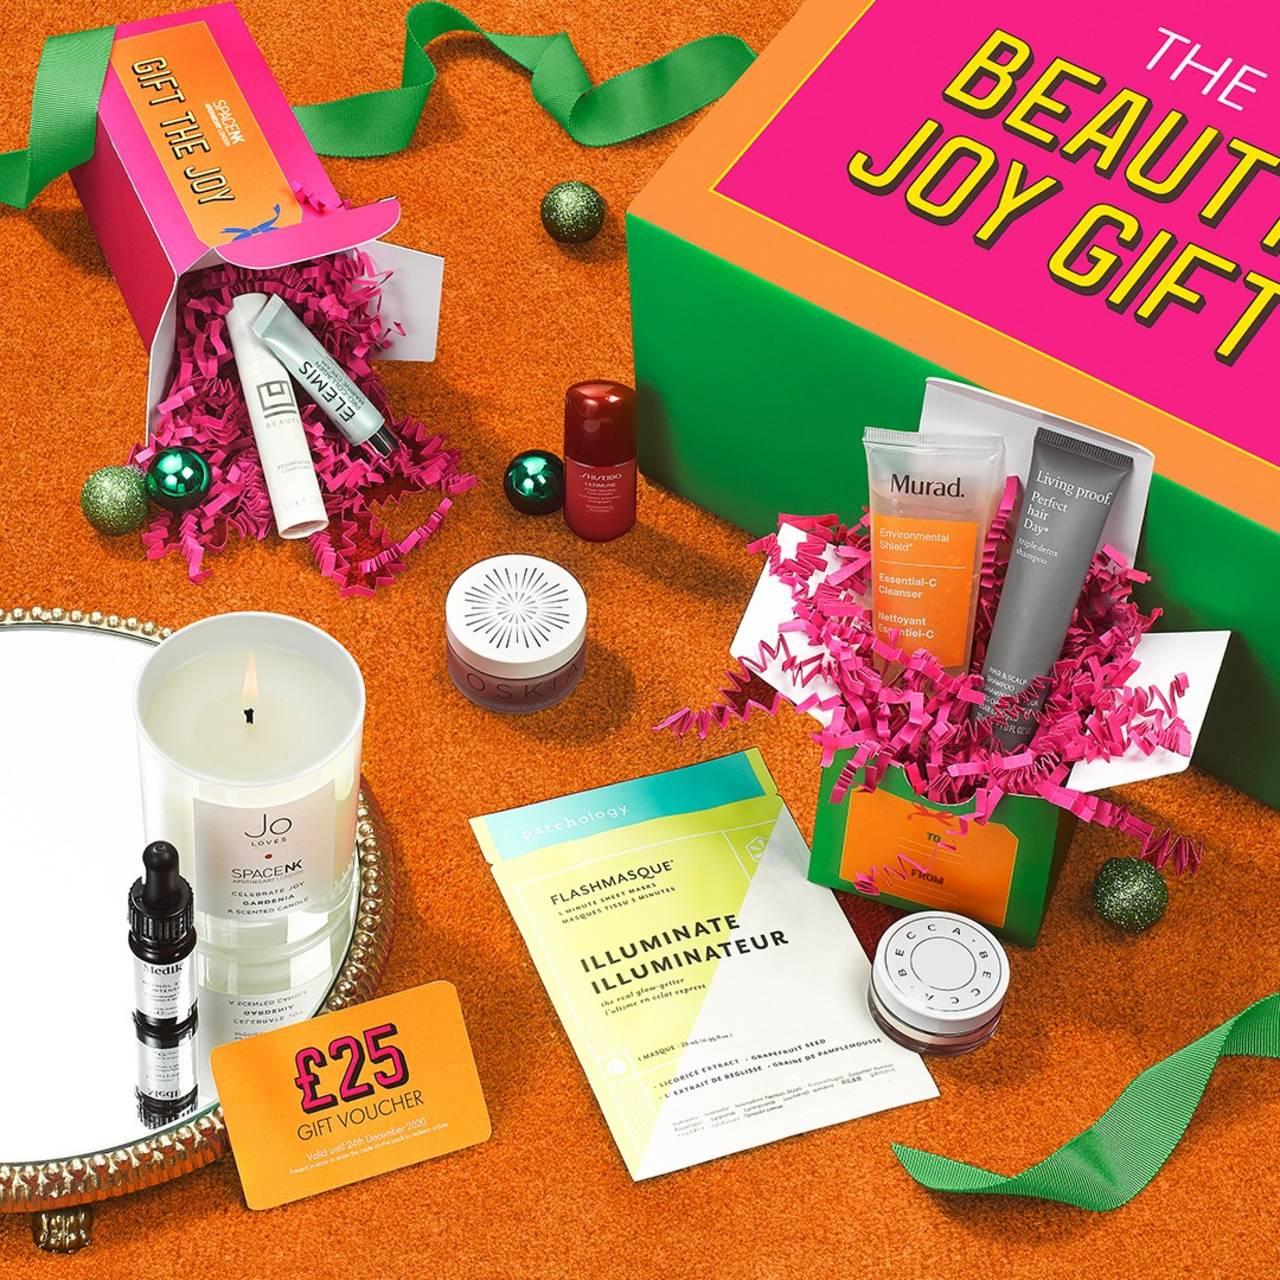 The Beauty Joy Gift de Space NK